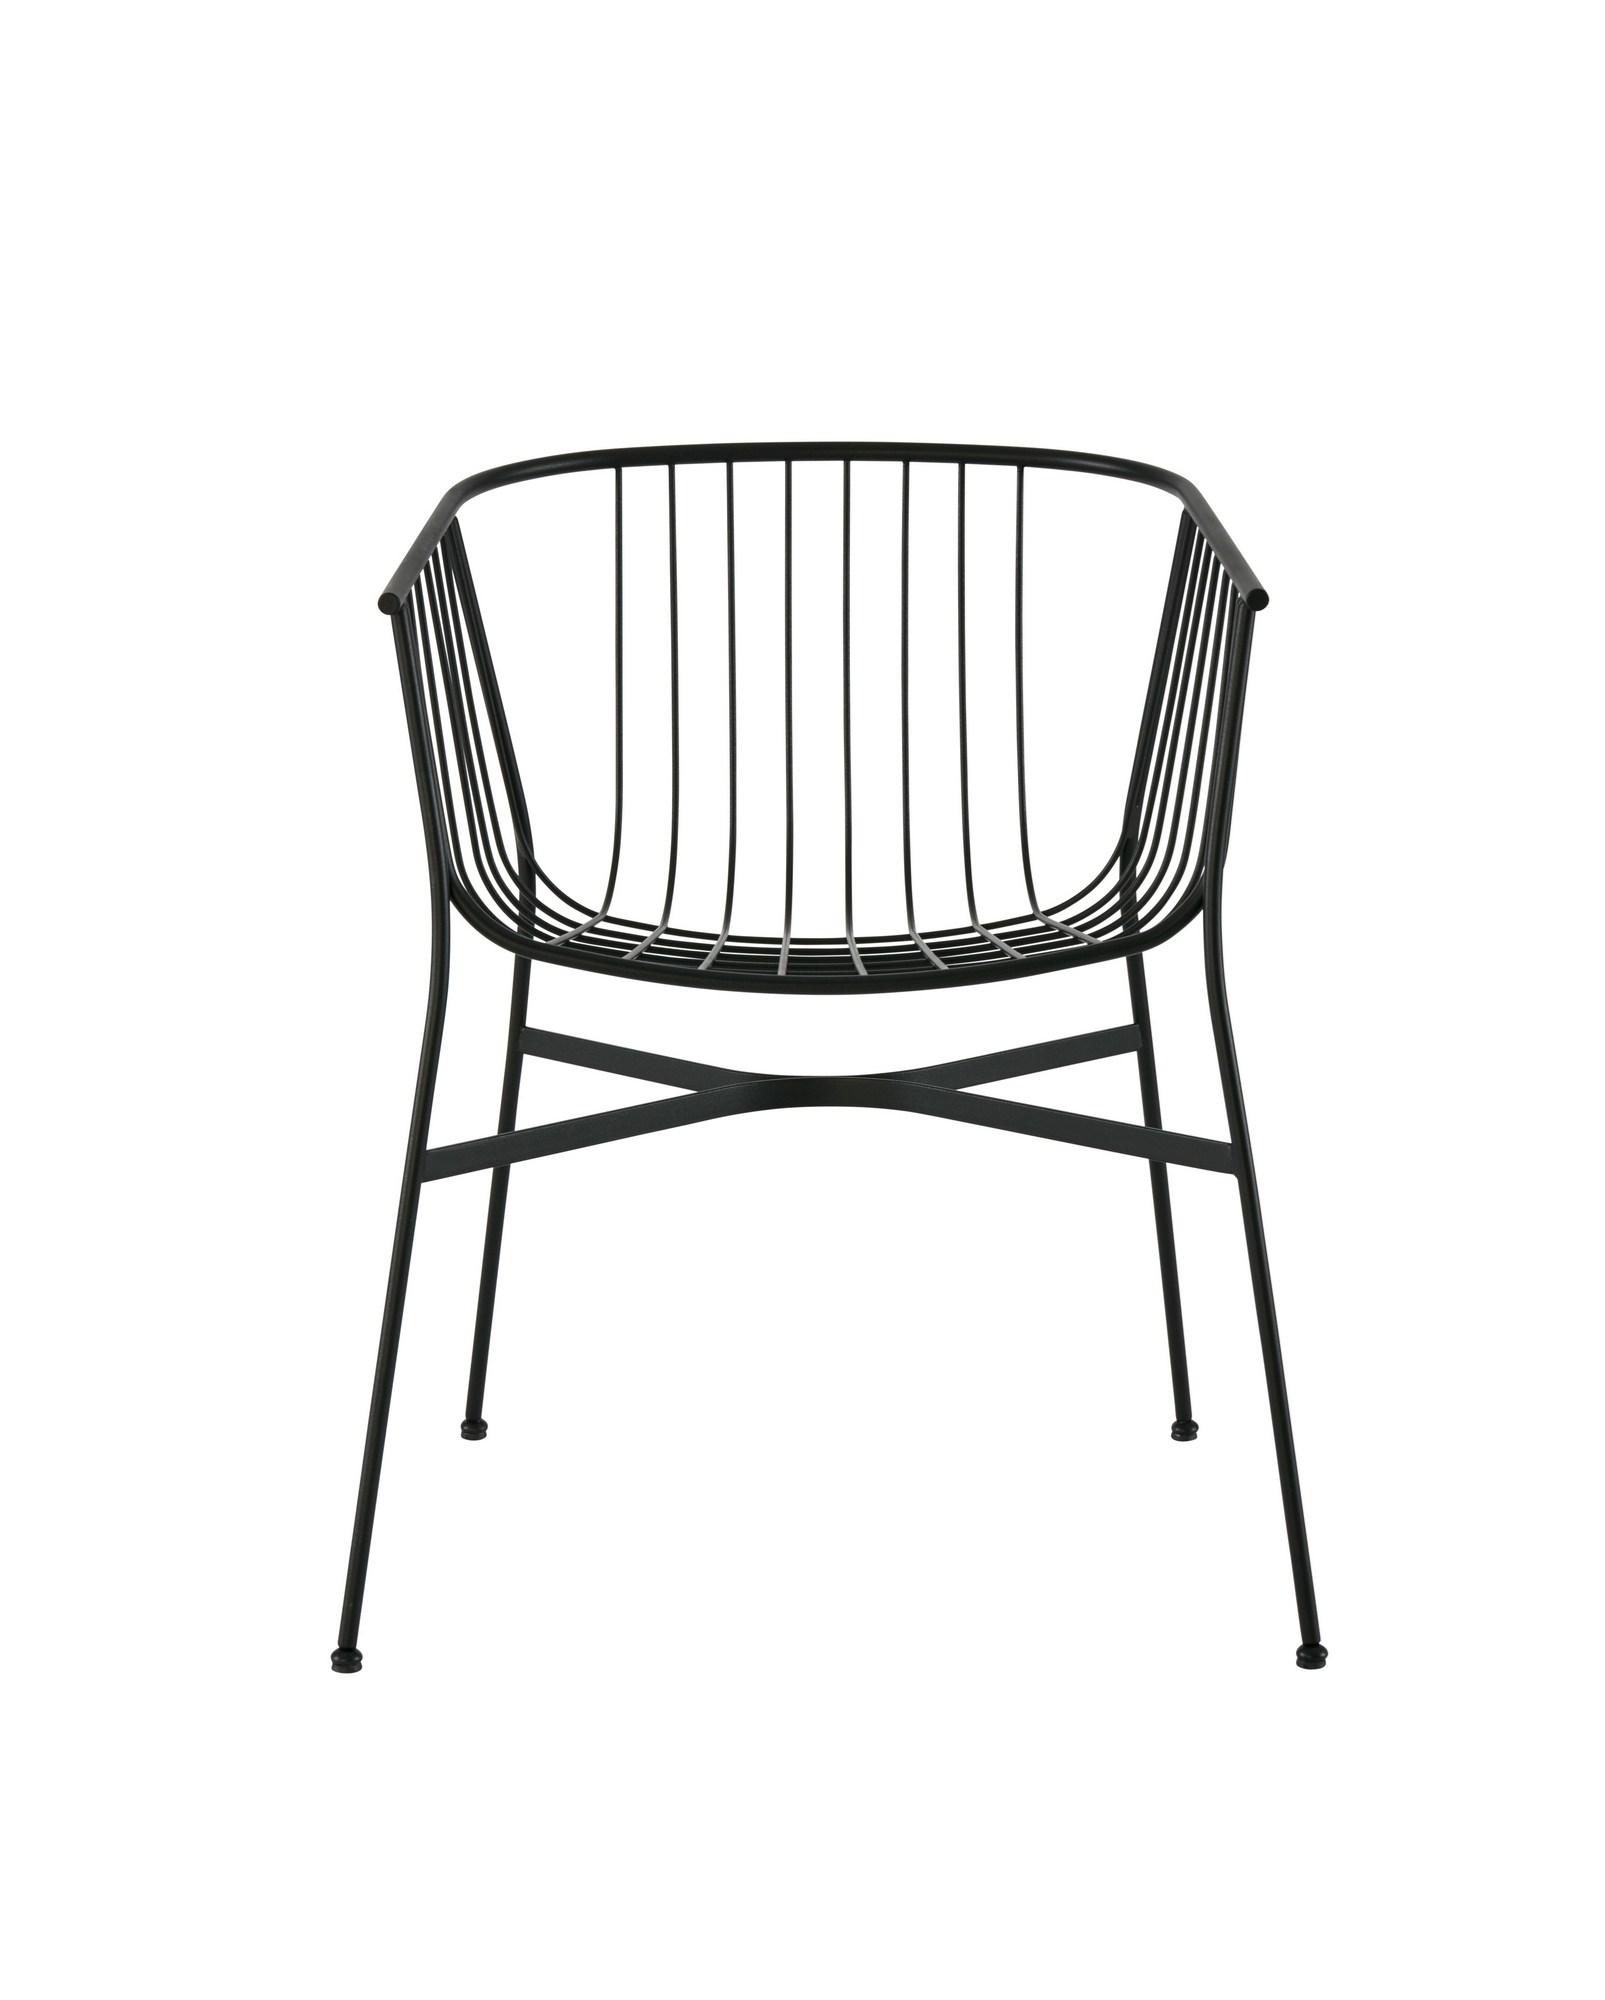 Powder Coated Steel Garden Chair by Tom Fereday